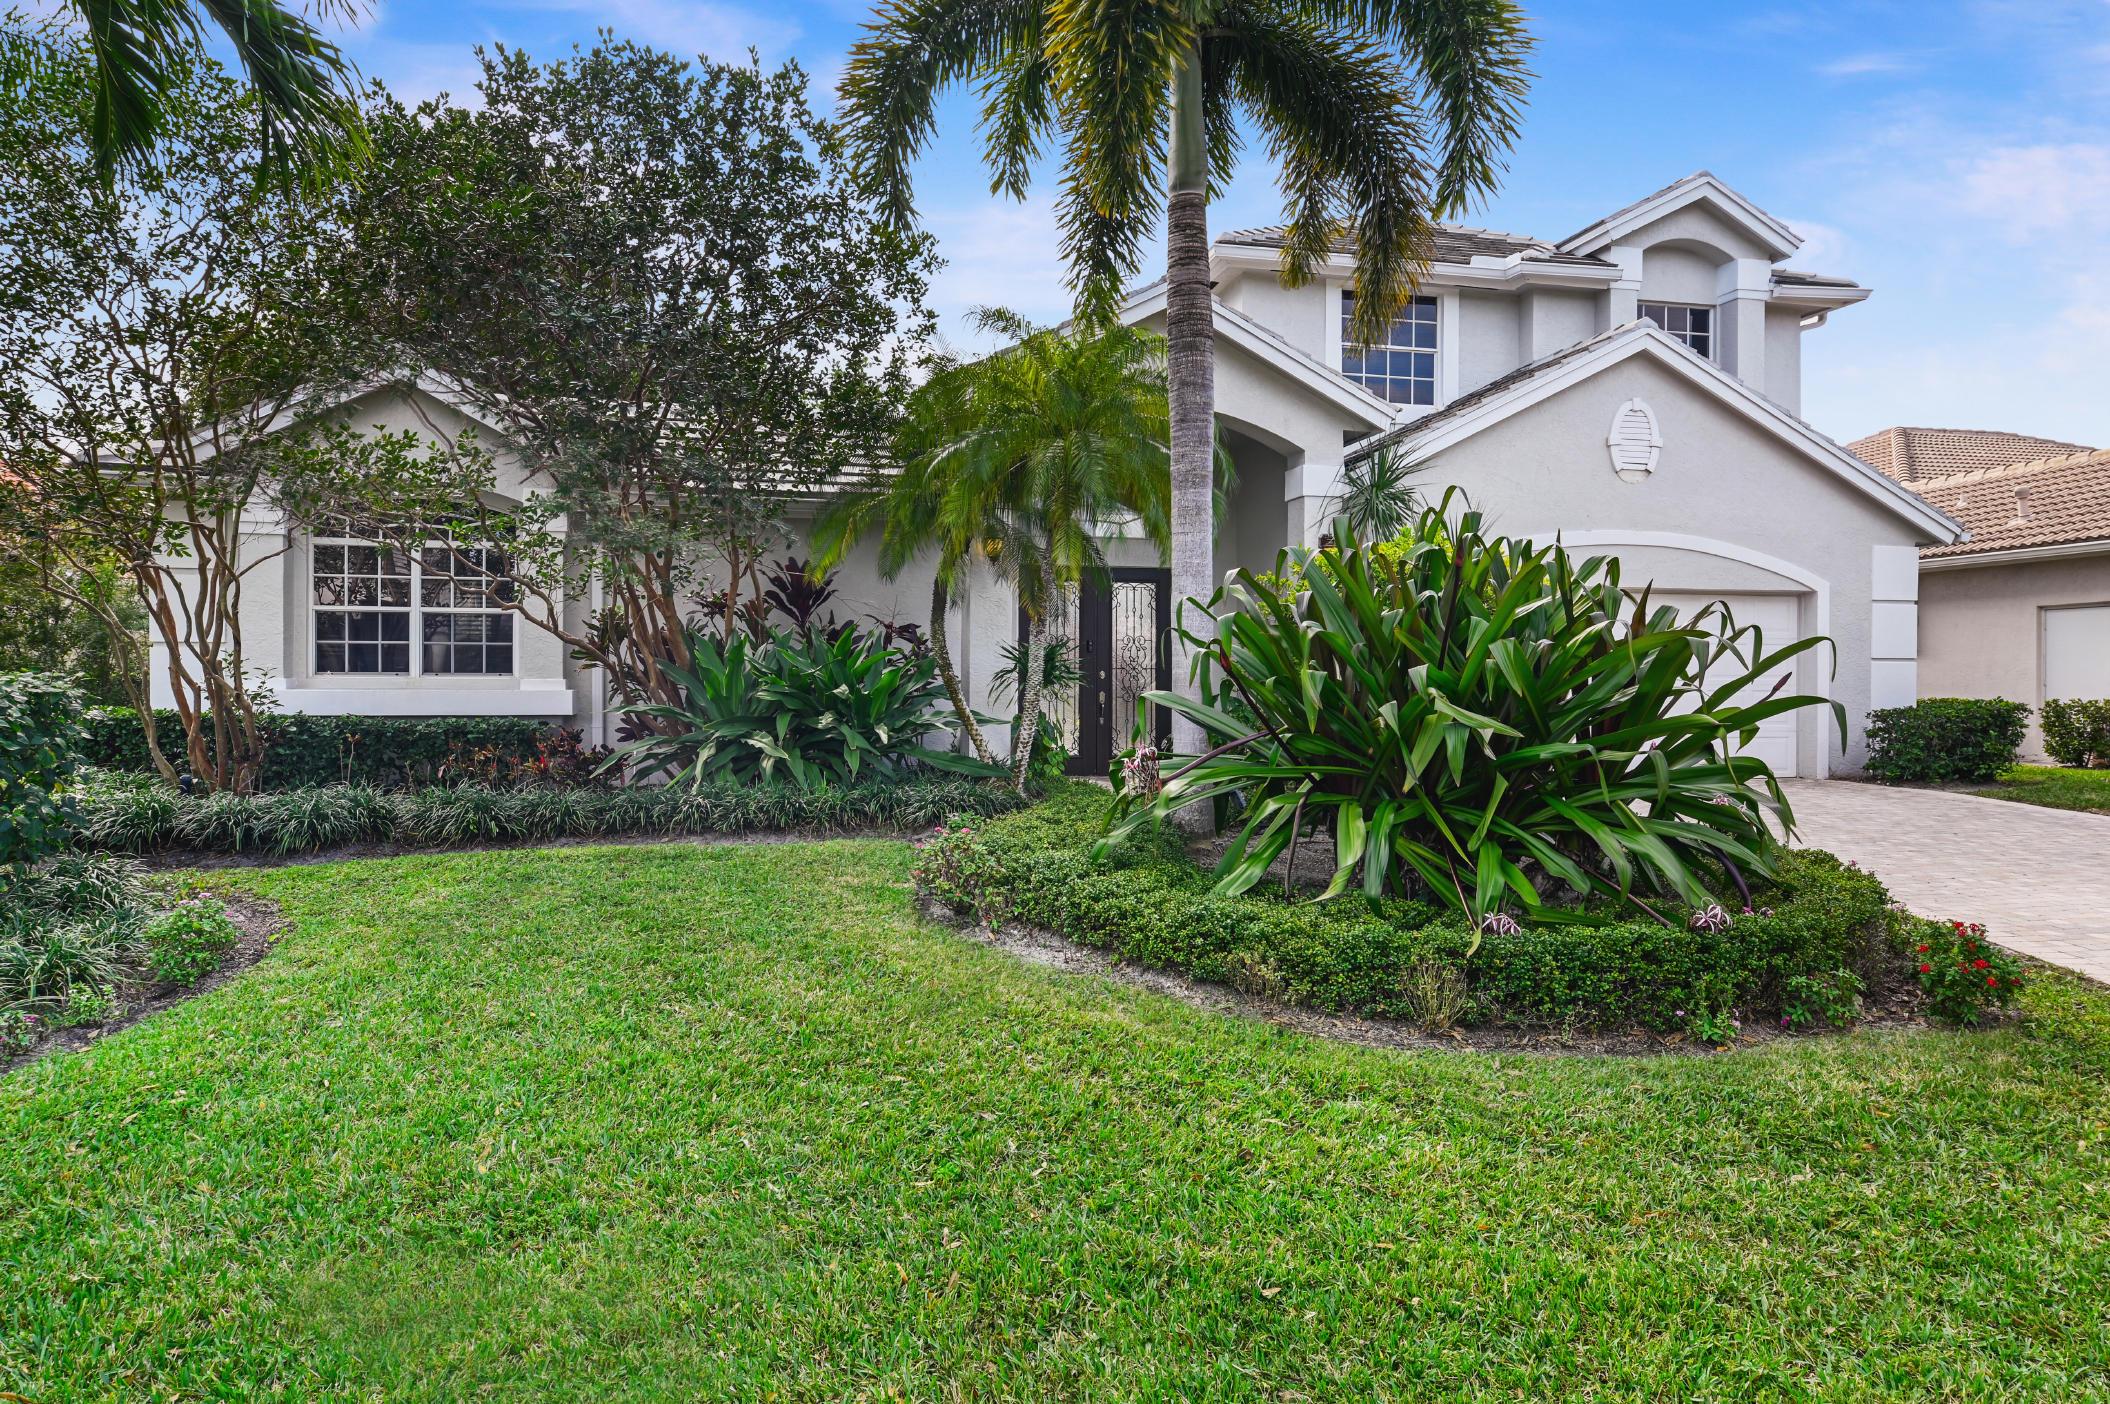 46 Bermuda Lake Drive, Palm Beach Gardens, Florida 33418, 5 Bedrooms Bedrooms, ,4.1 BathroomsBathrooms,A,Single family,Bermuda Lake,RX-10591054